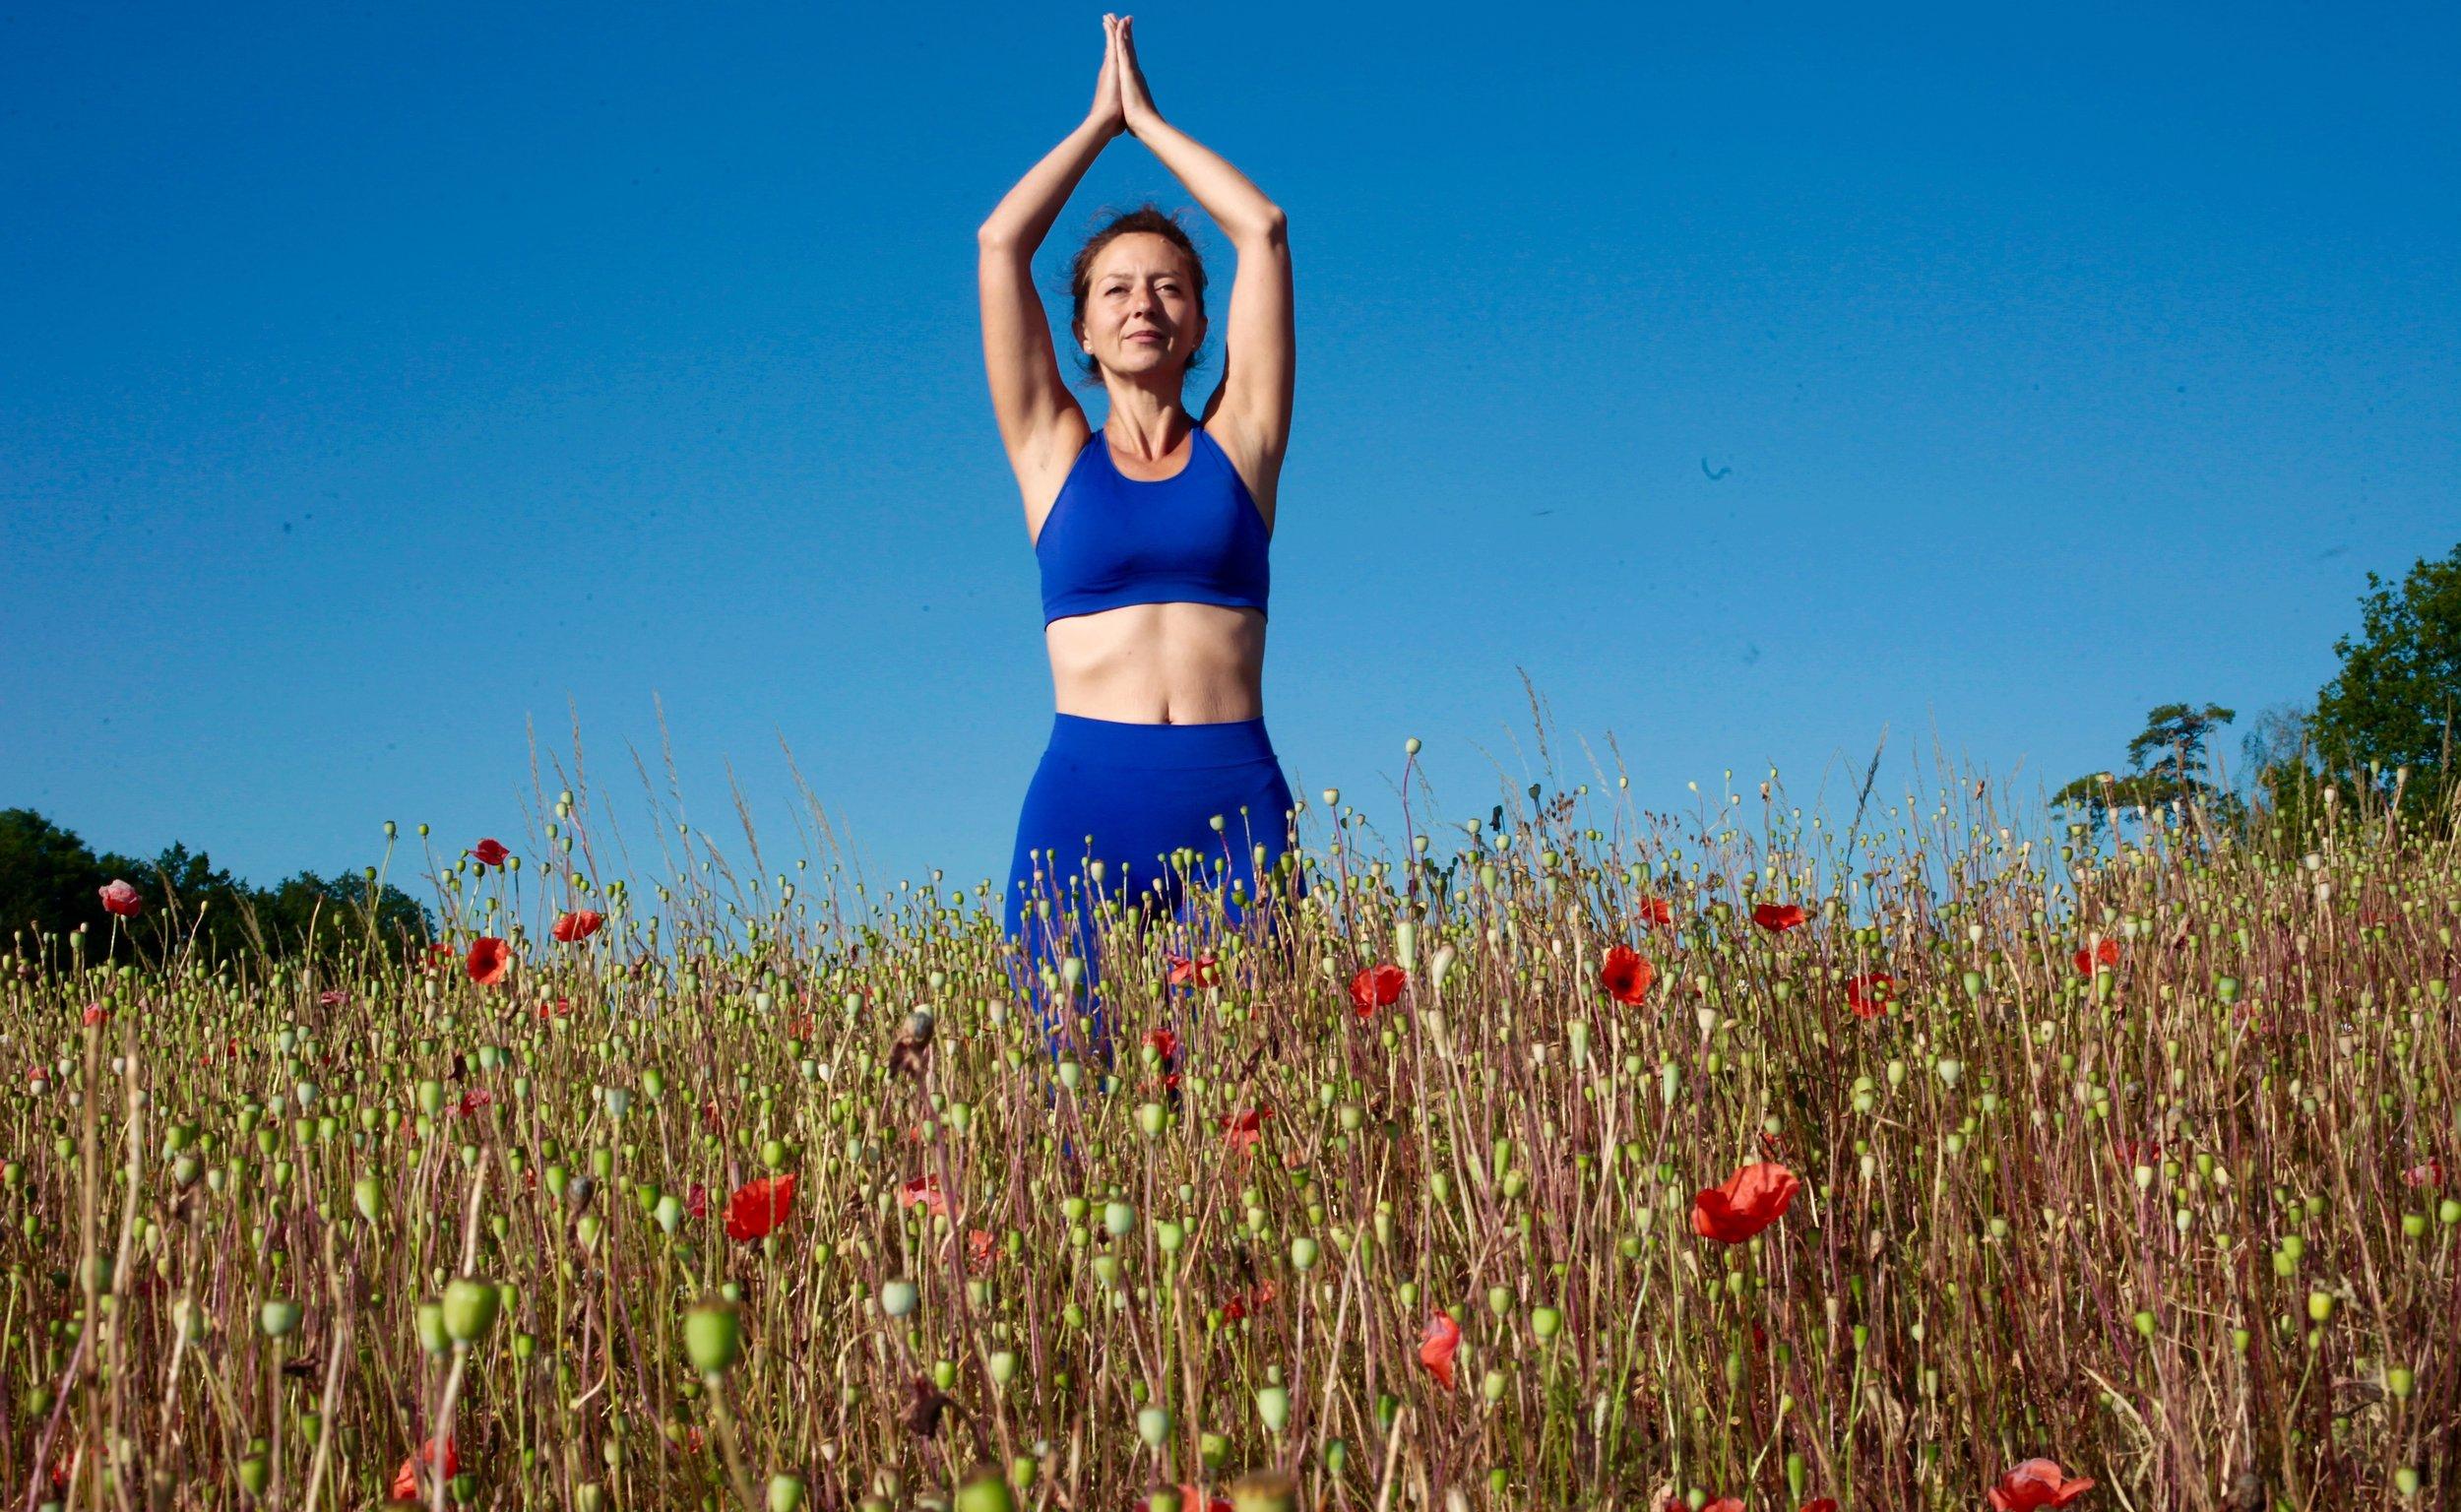 Sladjana Ivanovic / Yogalehrerin